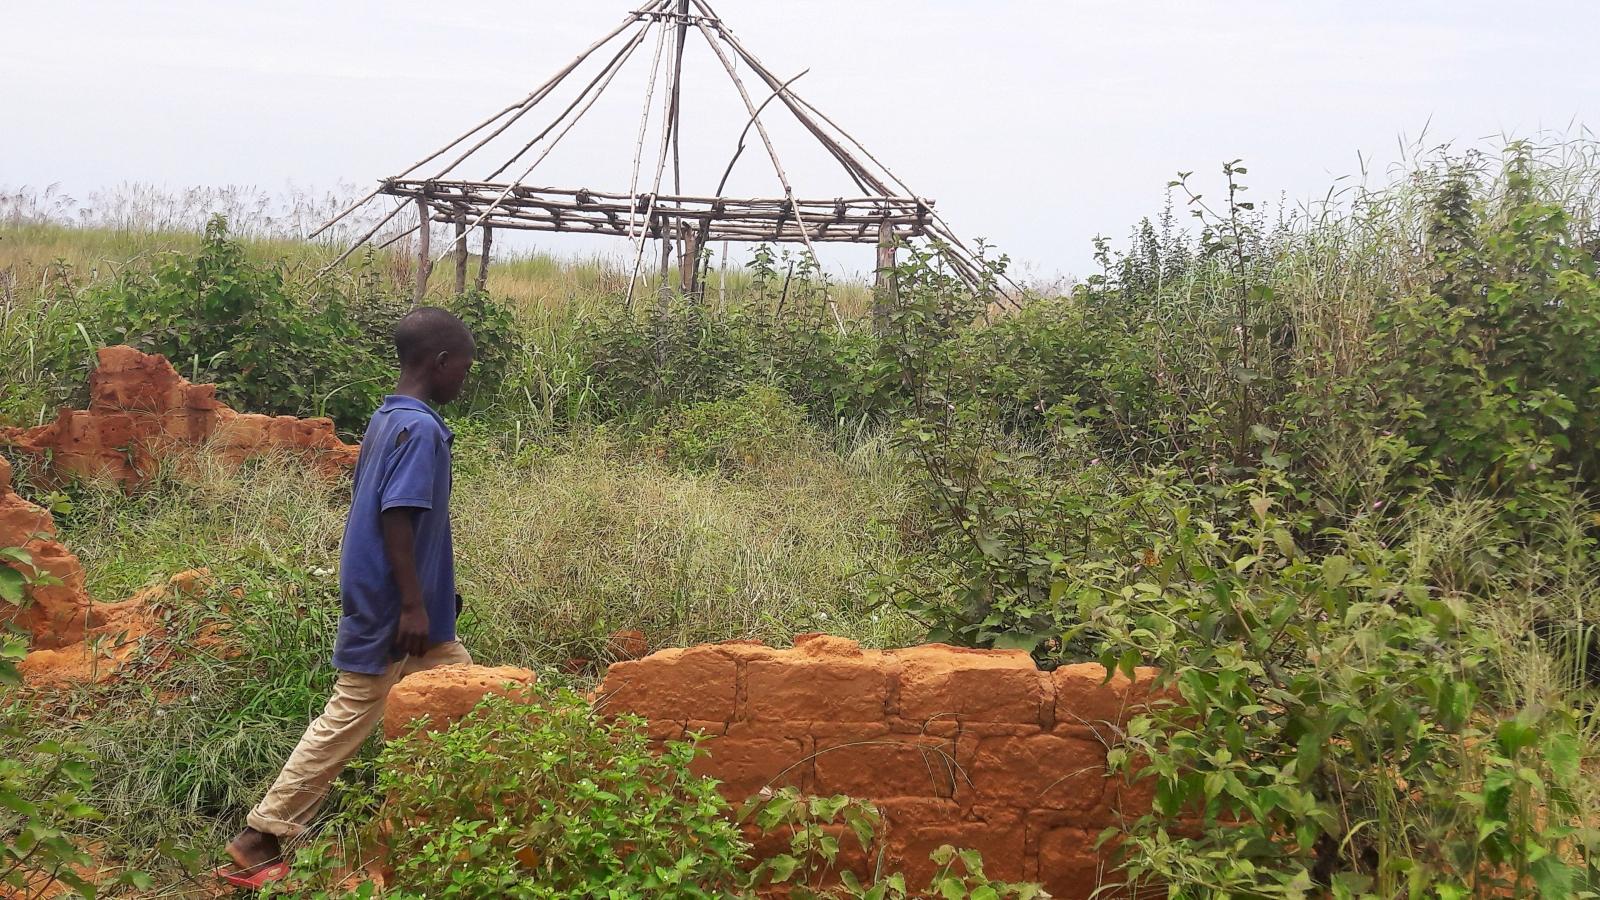 Kasai-Central Province, DRC